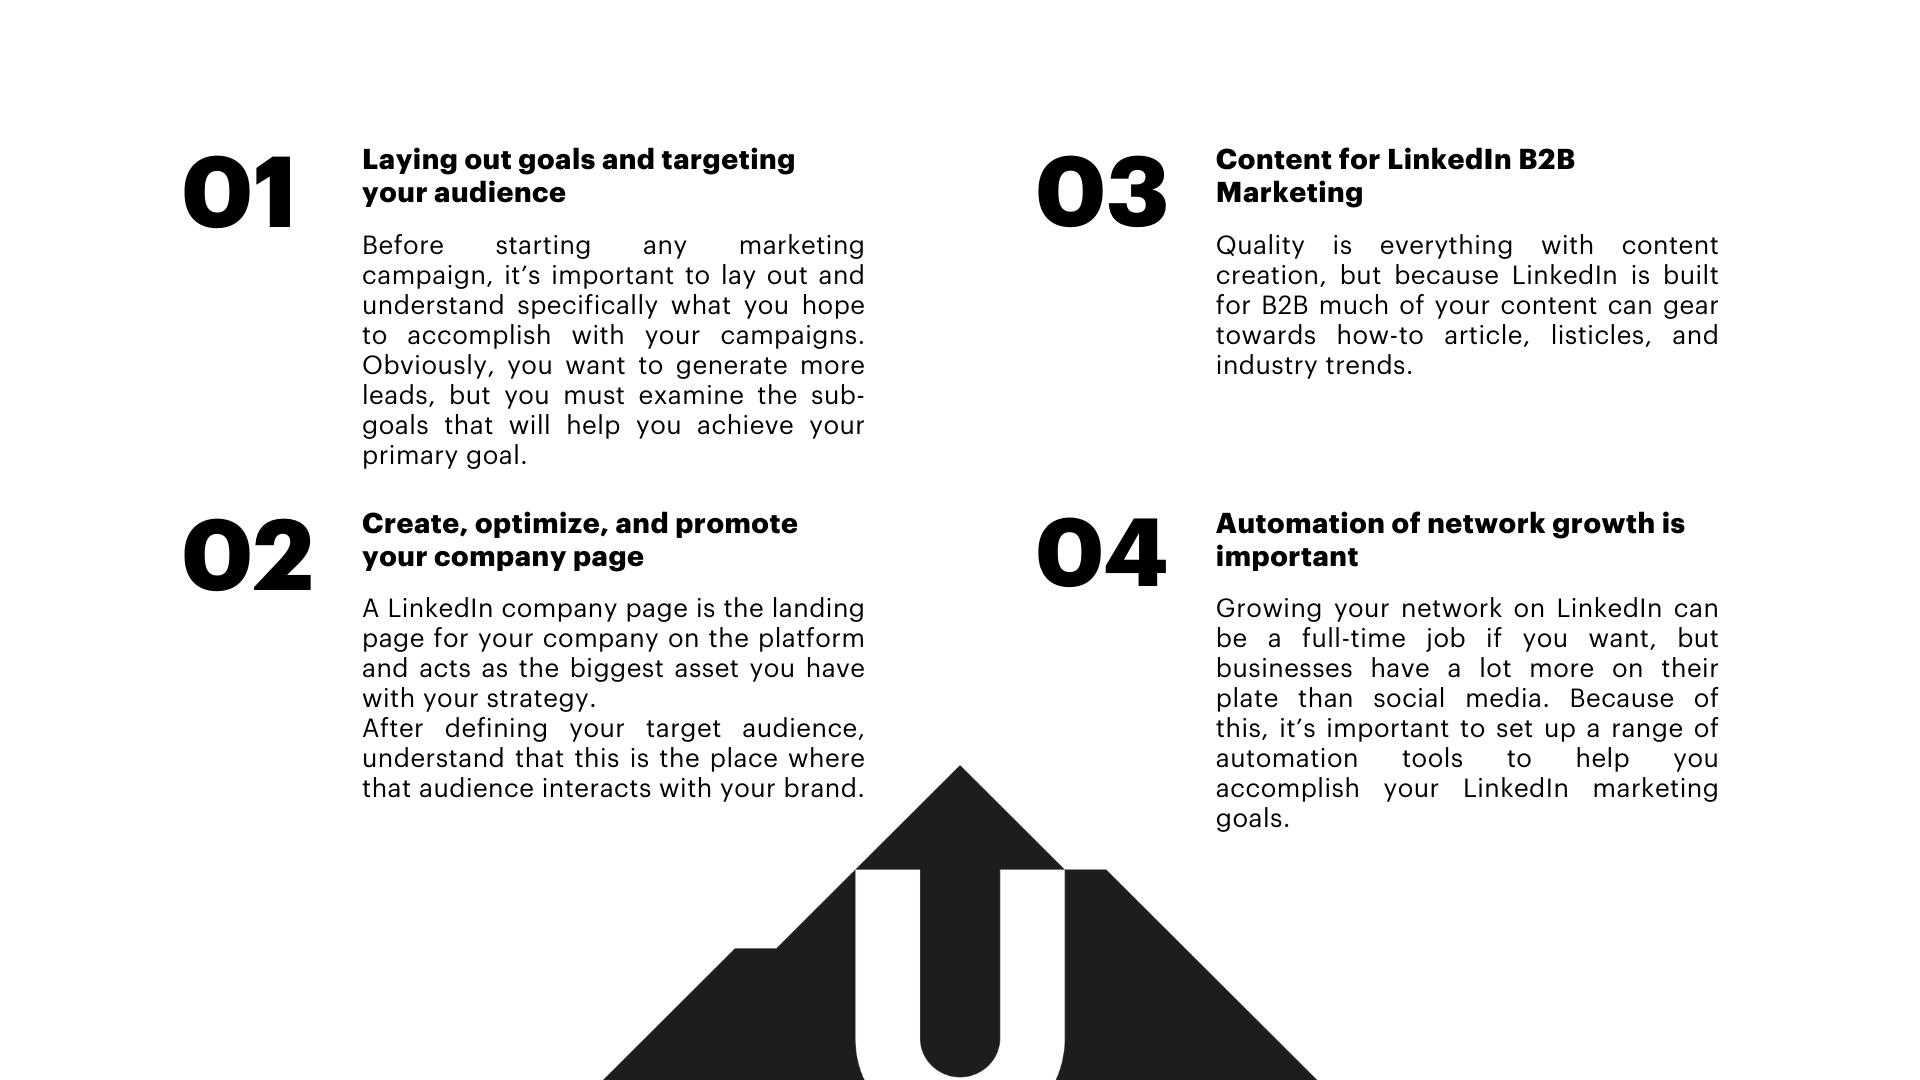 How to develop a LinkedIn Marketing Strategy